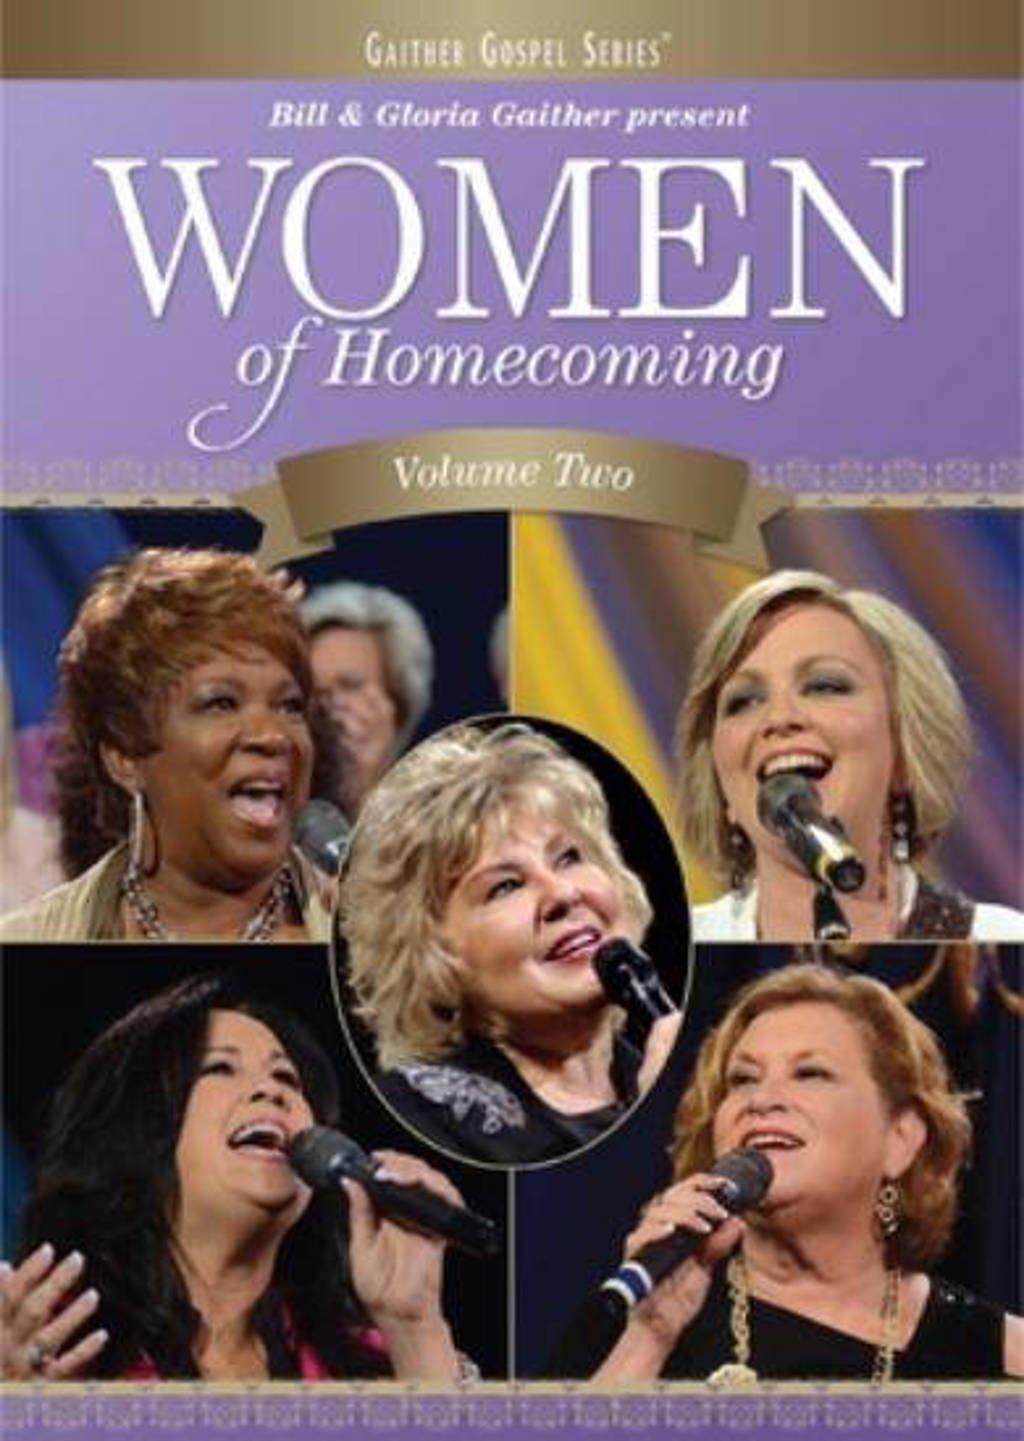 Bill & Gloria Gaither - Women Of Homecoming Volume Two (DVD)